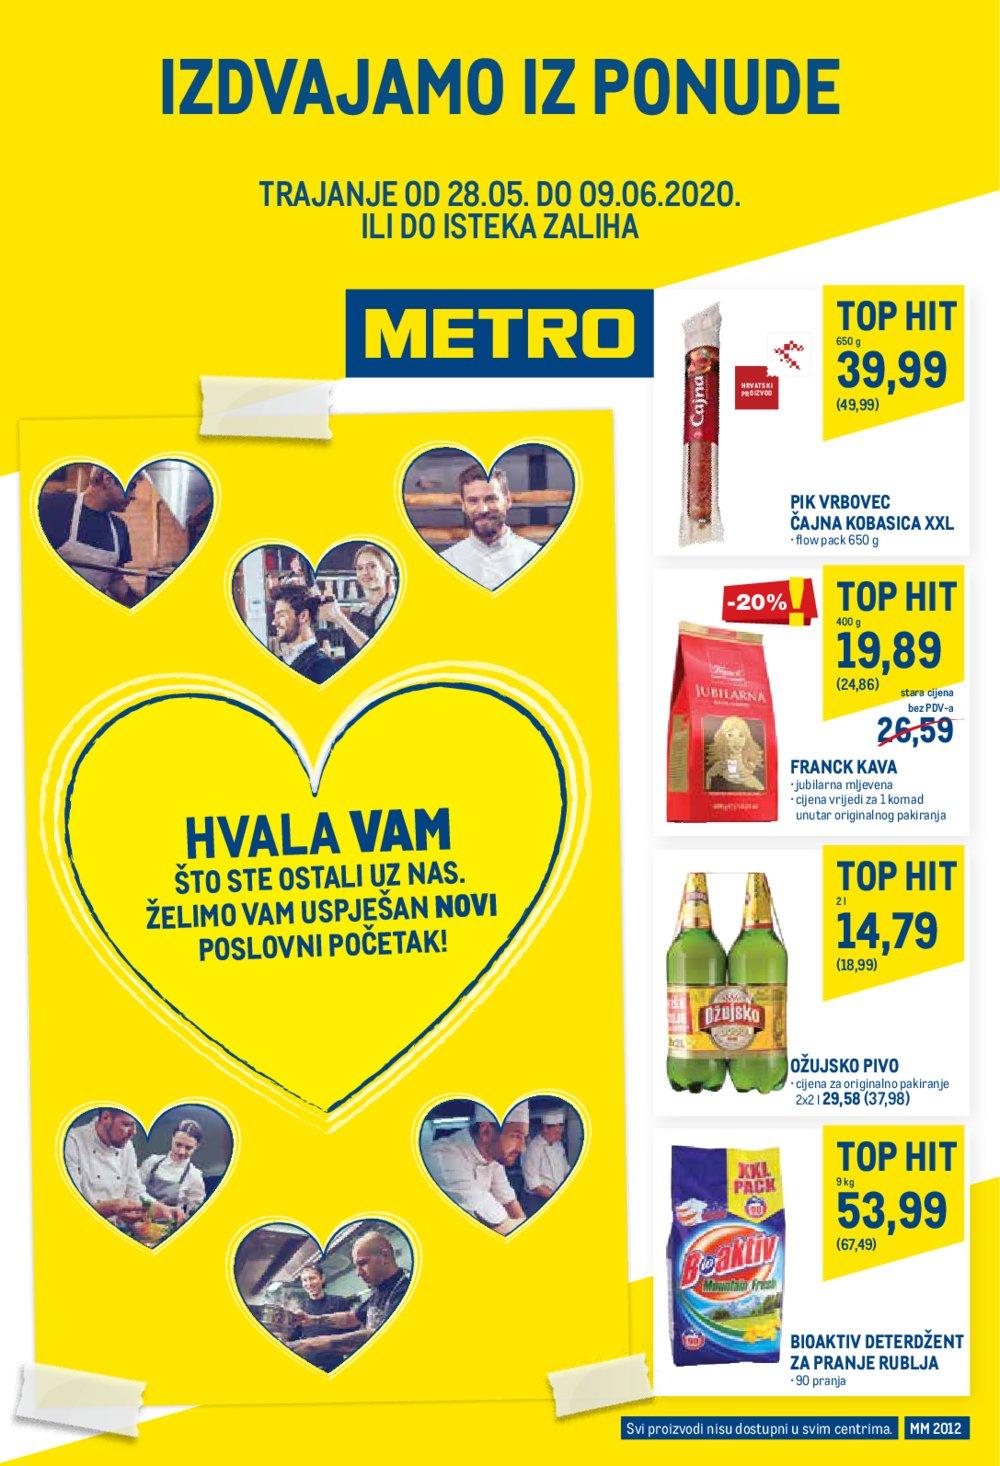 Metro katalog Izdvojeno iz ponude 28.05.-09.06.2020. Jankomir i Sesvete